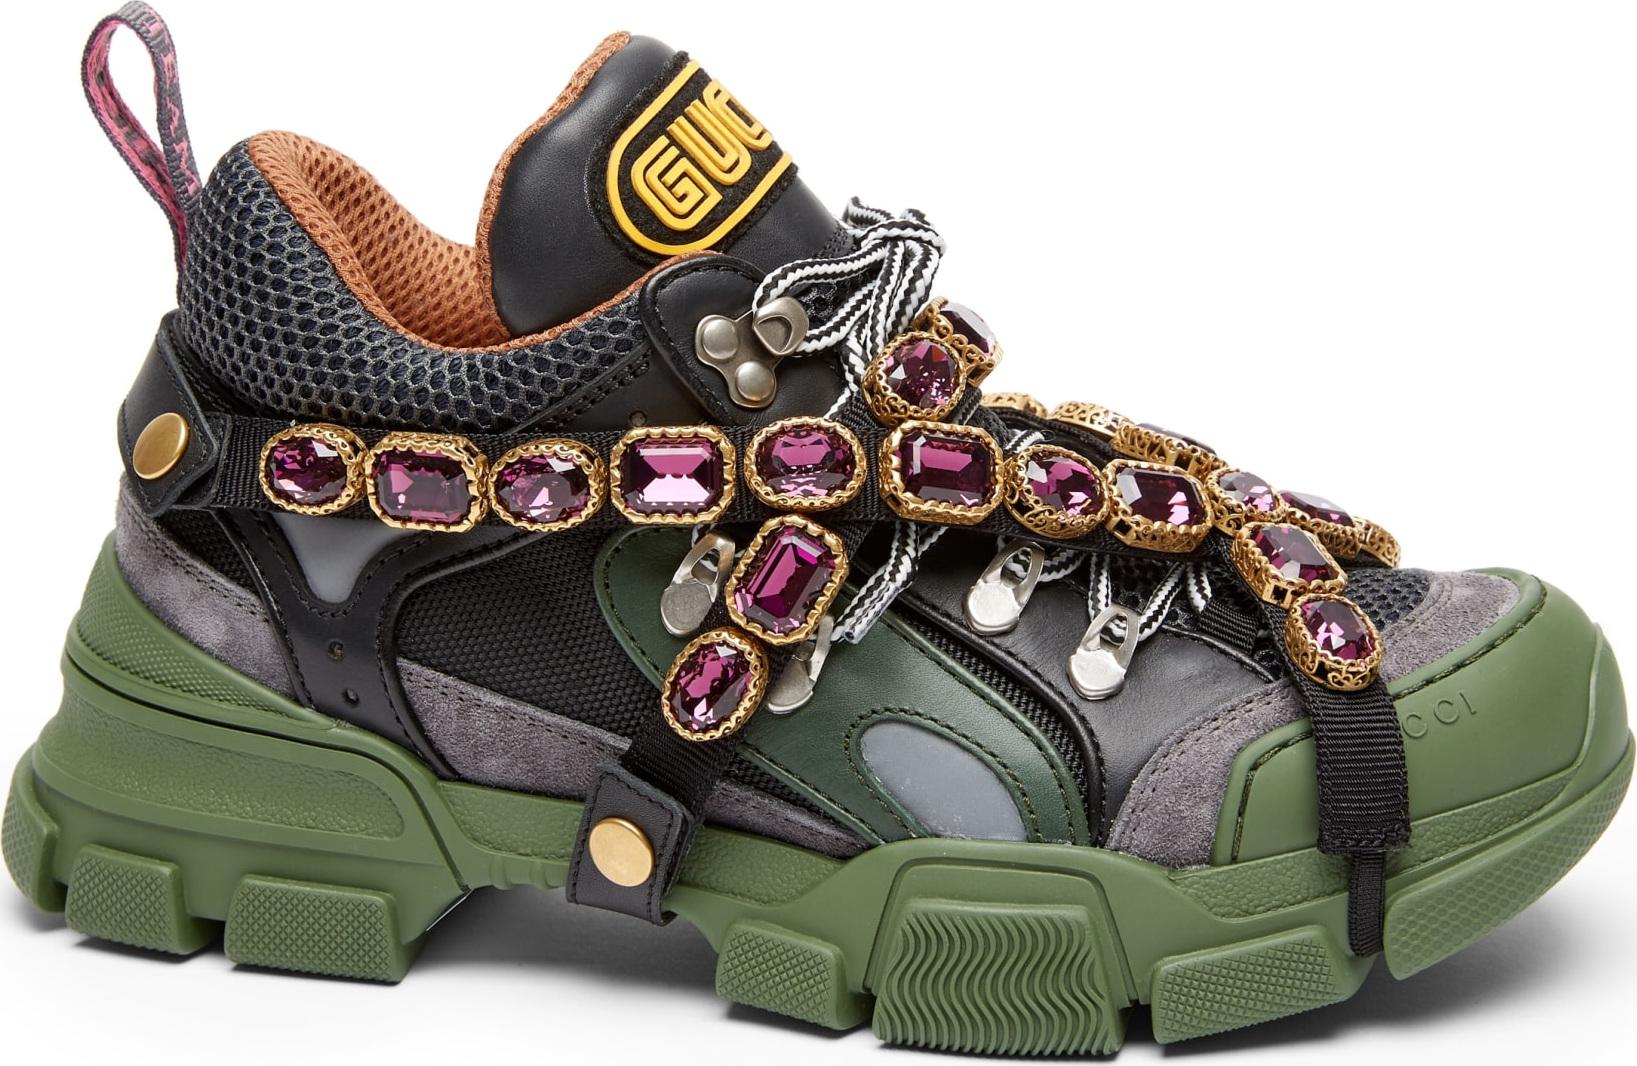 Gucci Flashtrek Jewel Sneaker - Luxed